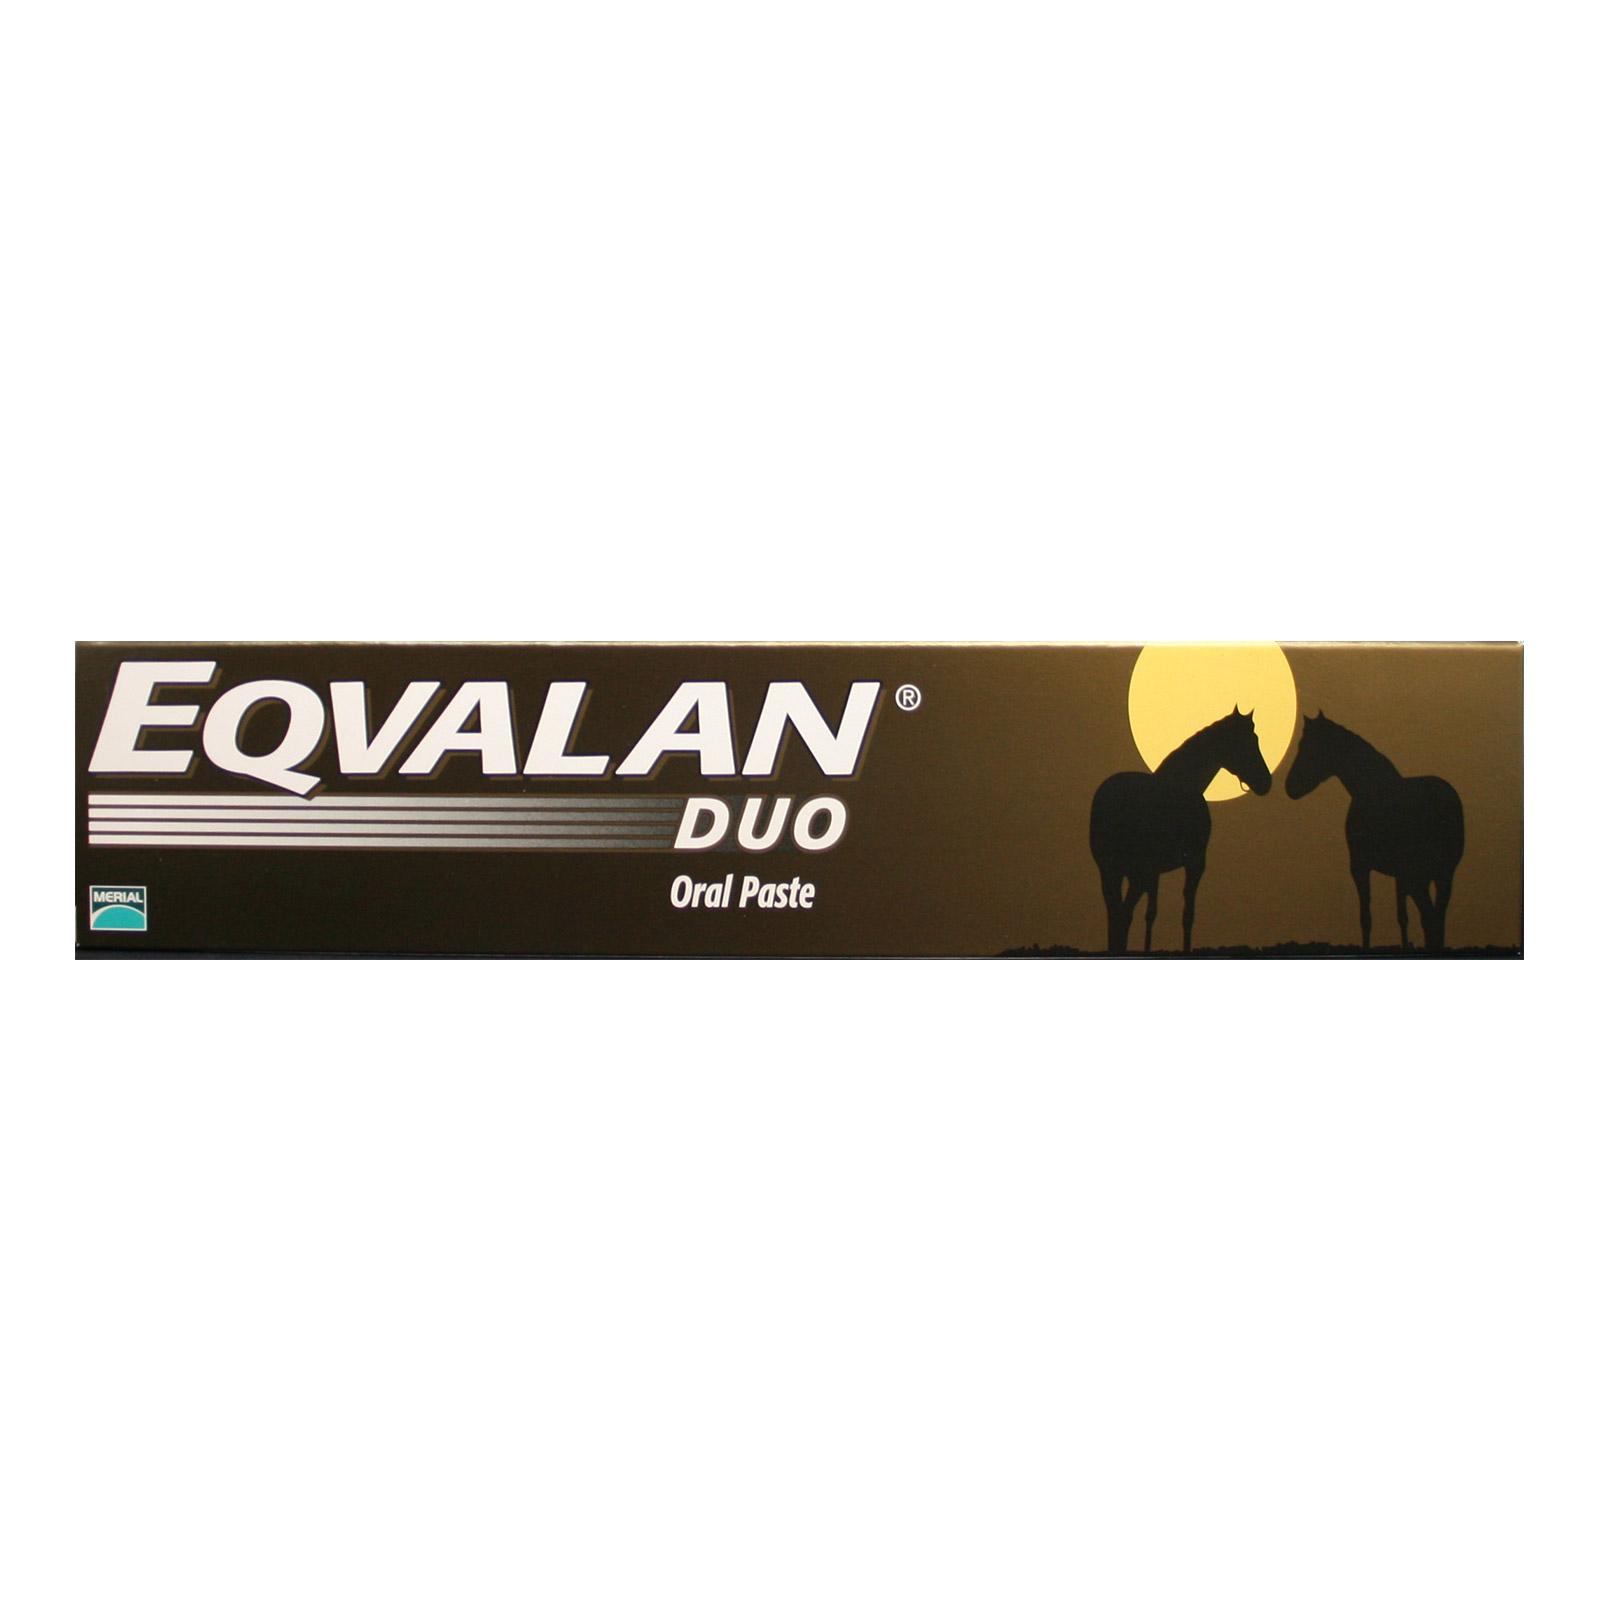 Eqvalan-Duo-7.74gm.jpg